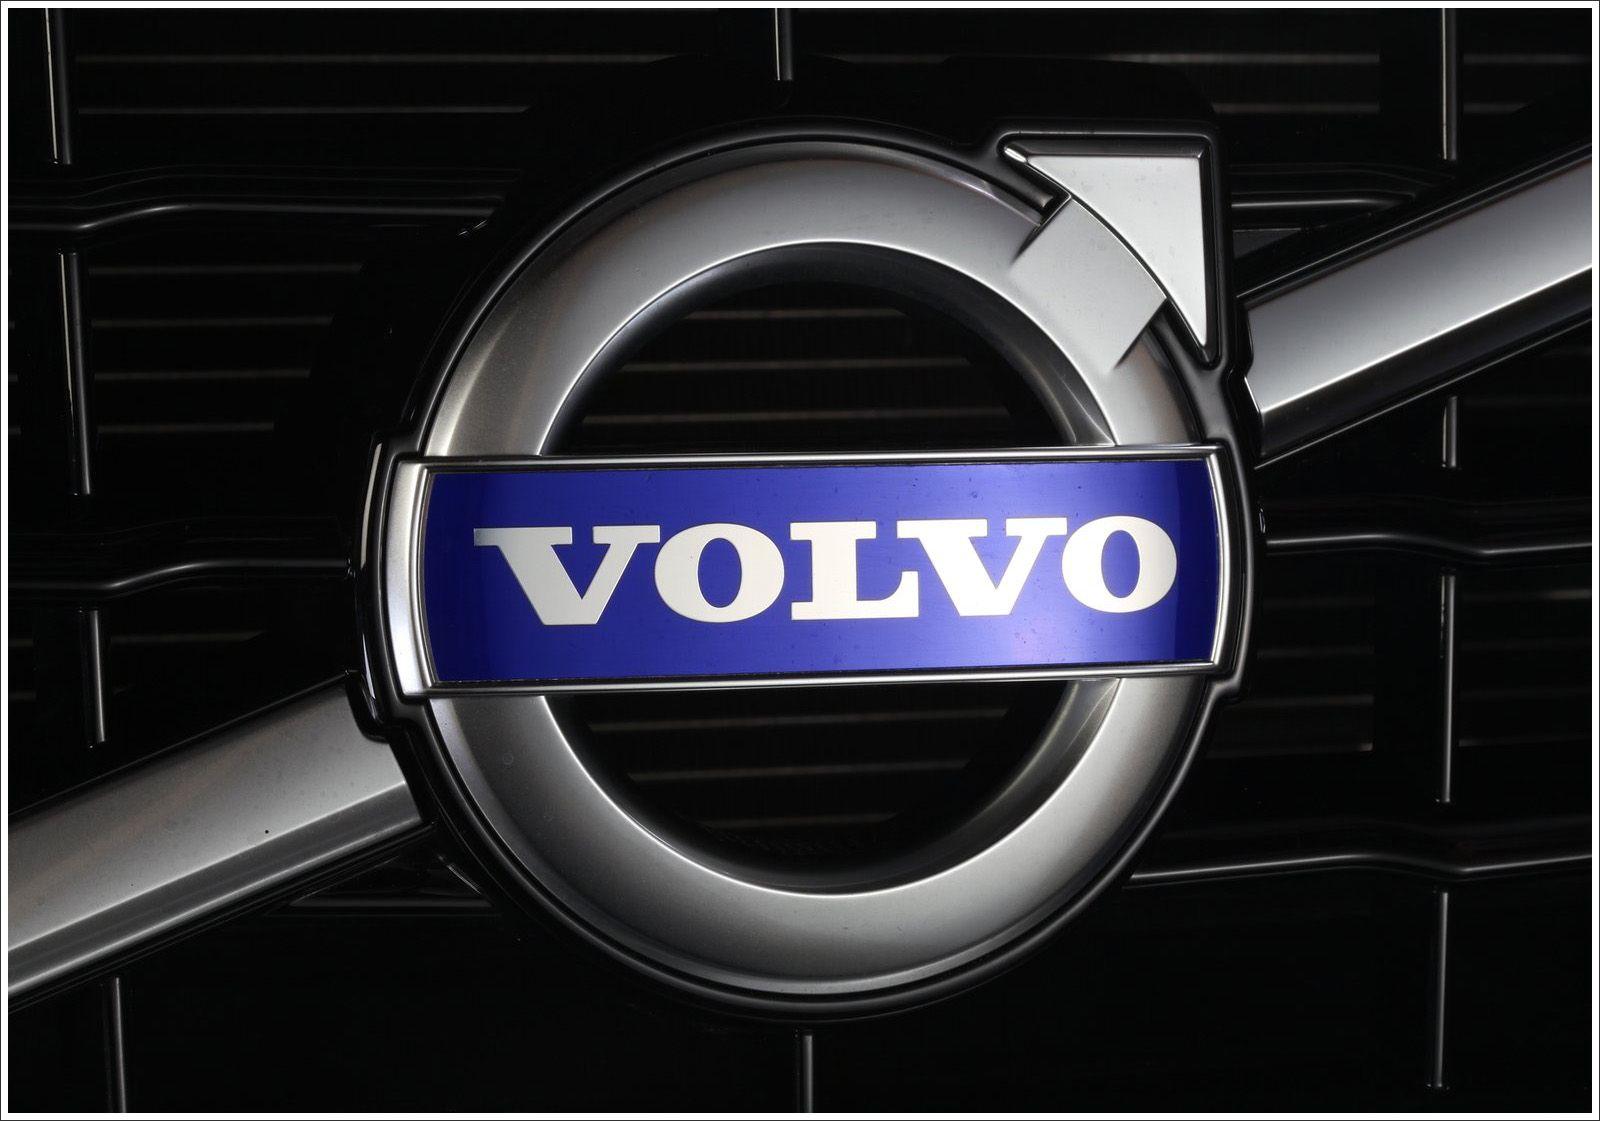 Volvo Logo Wallpaper Phone 5AB Cars Pinterest Volvo Cars 1600x1121